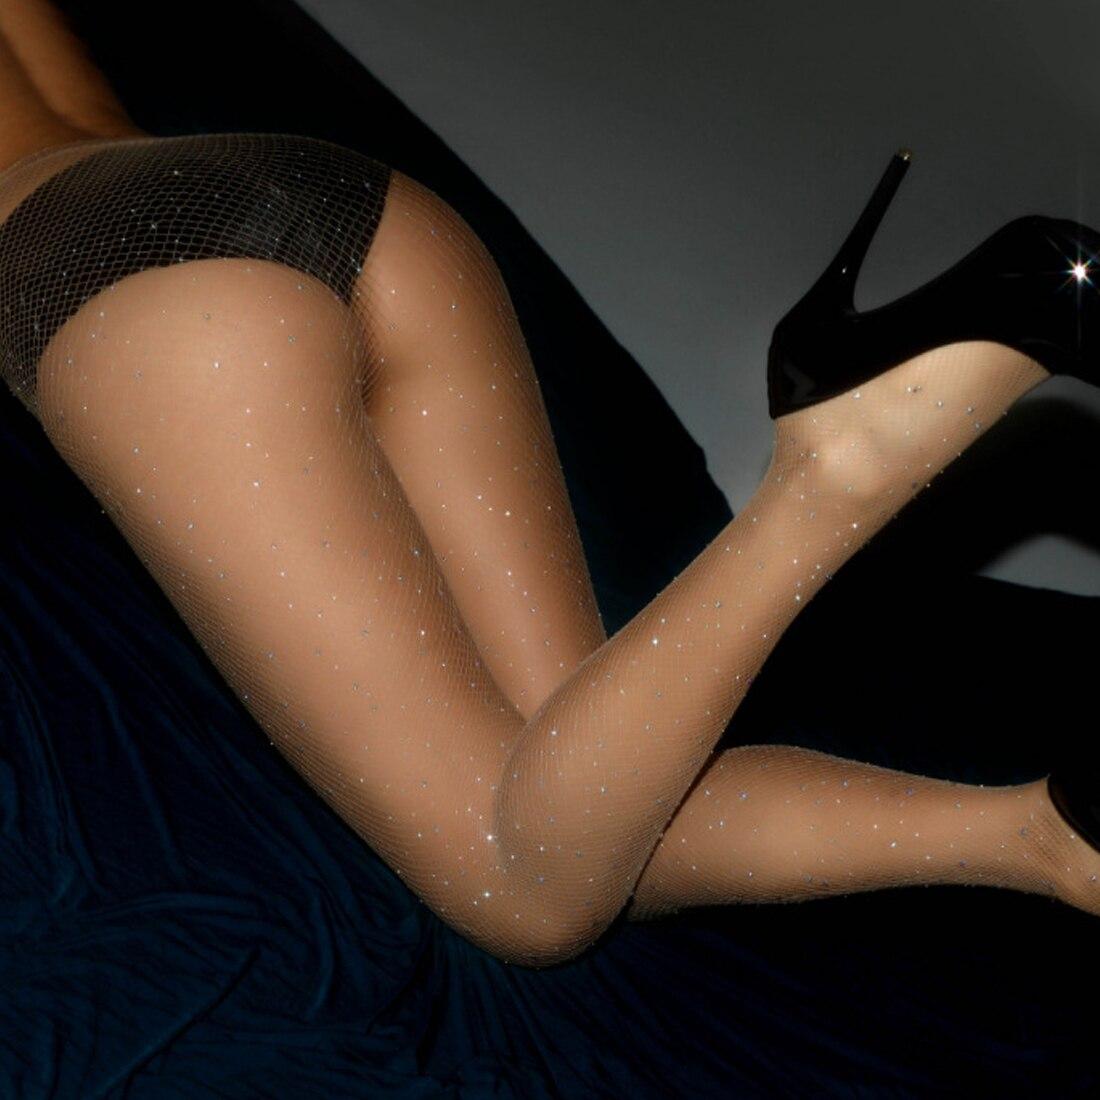 Women High Waist Diamond Fishnet Stockings Sparkle Rhinestone Tight Pantyhose Lady Girl Hoseiry